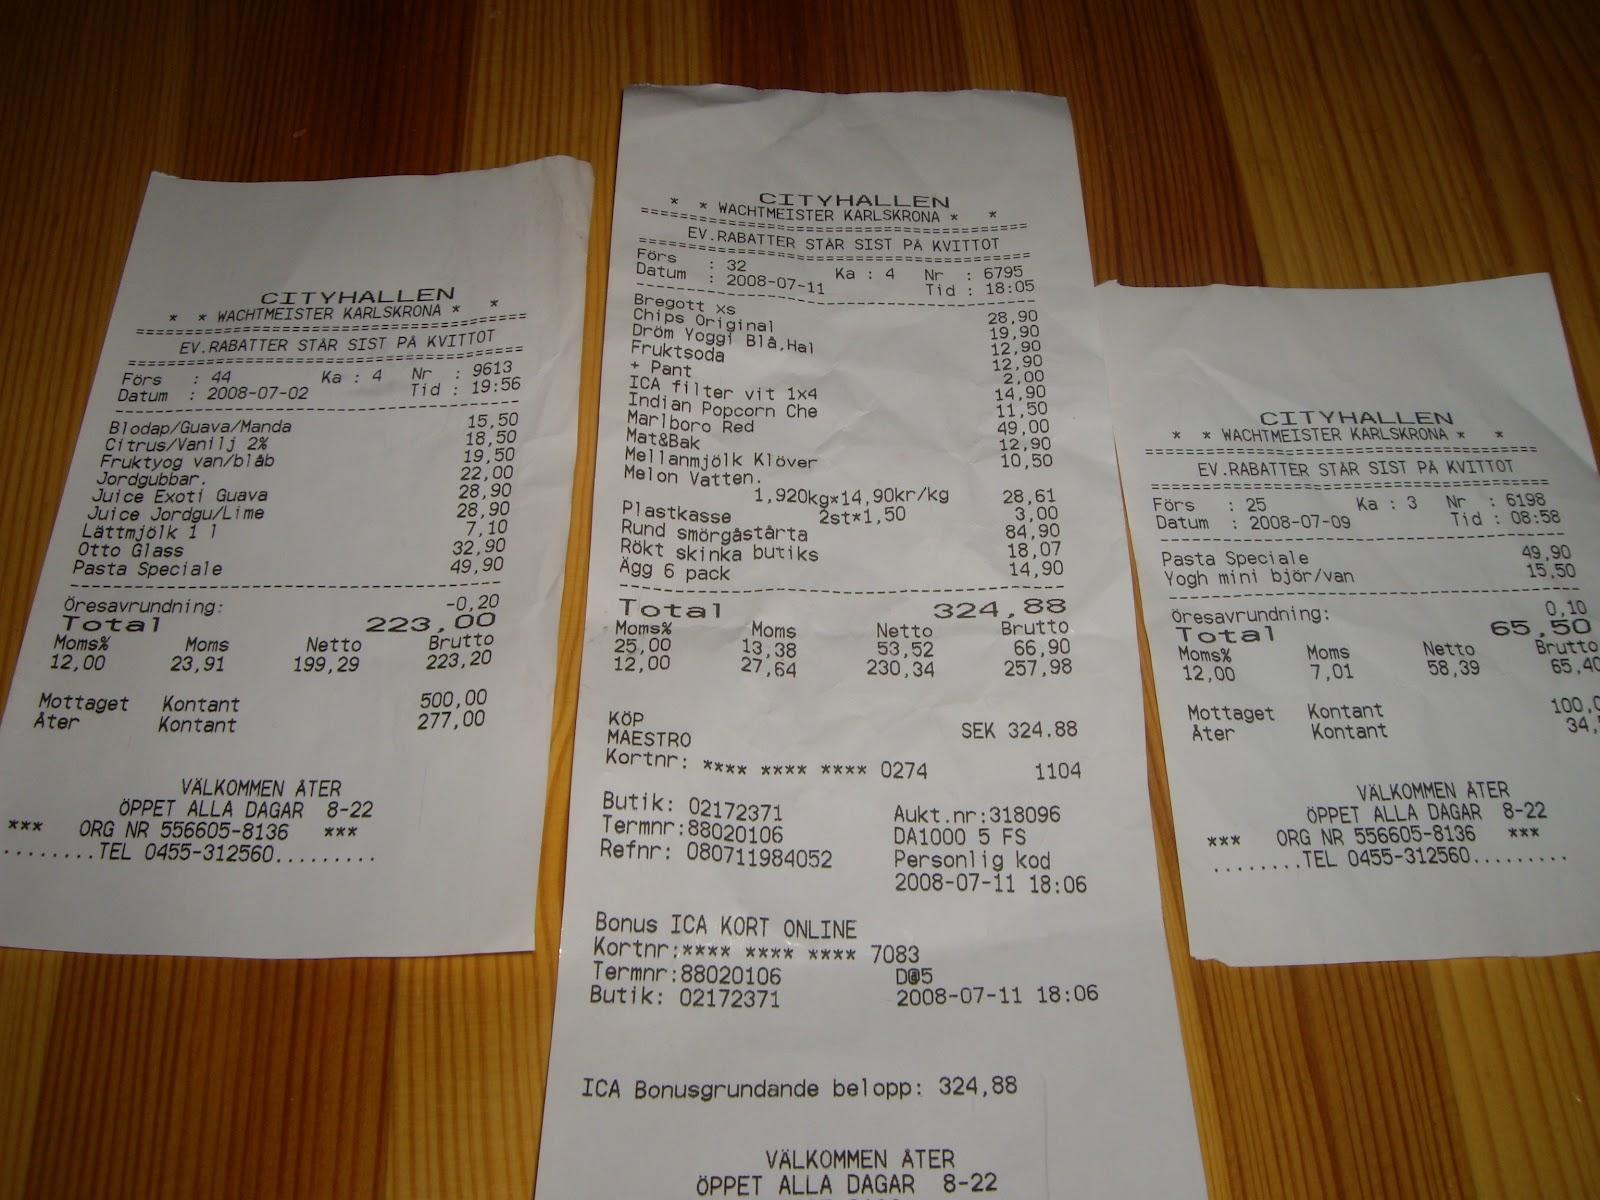 Cyb3rcrim3 Polo Markdowns And Embezzlement